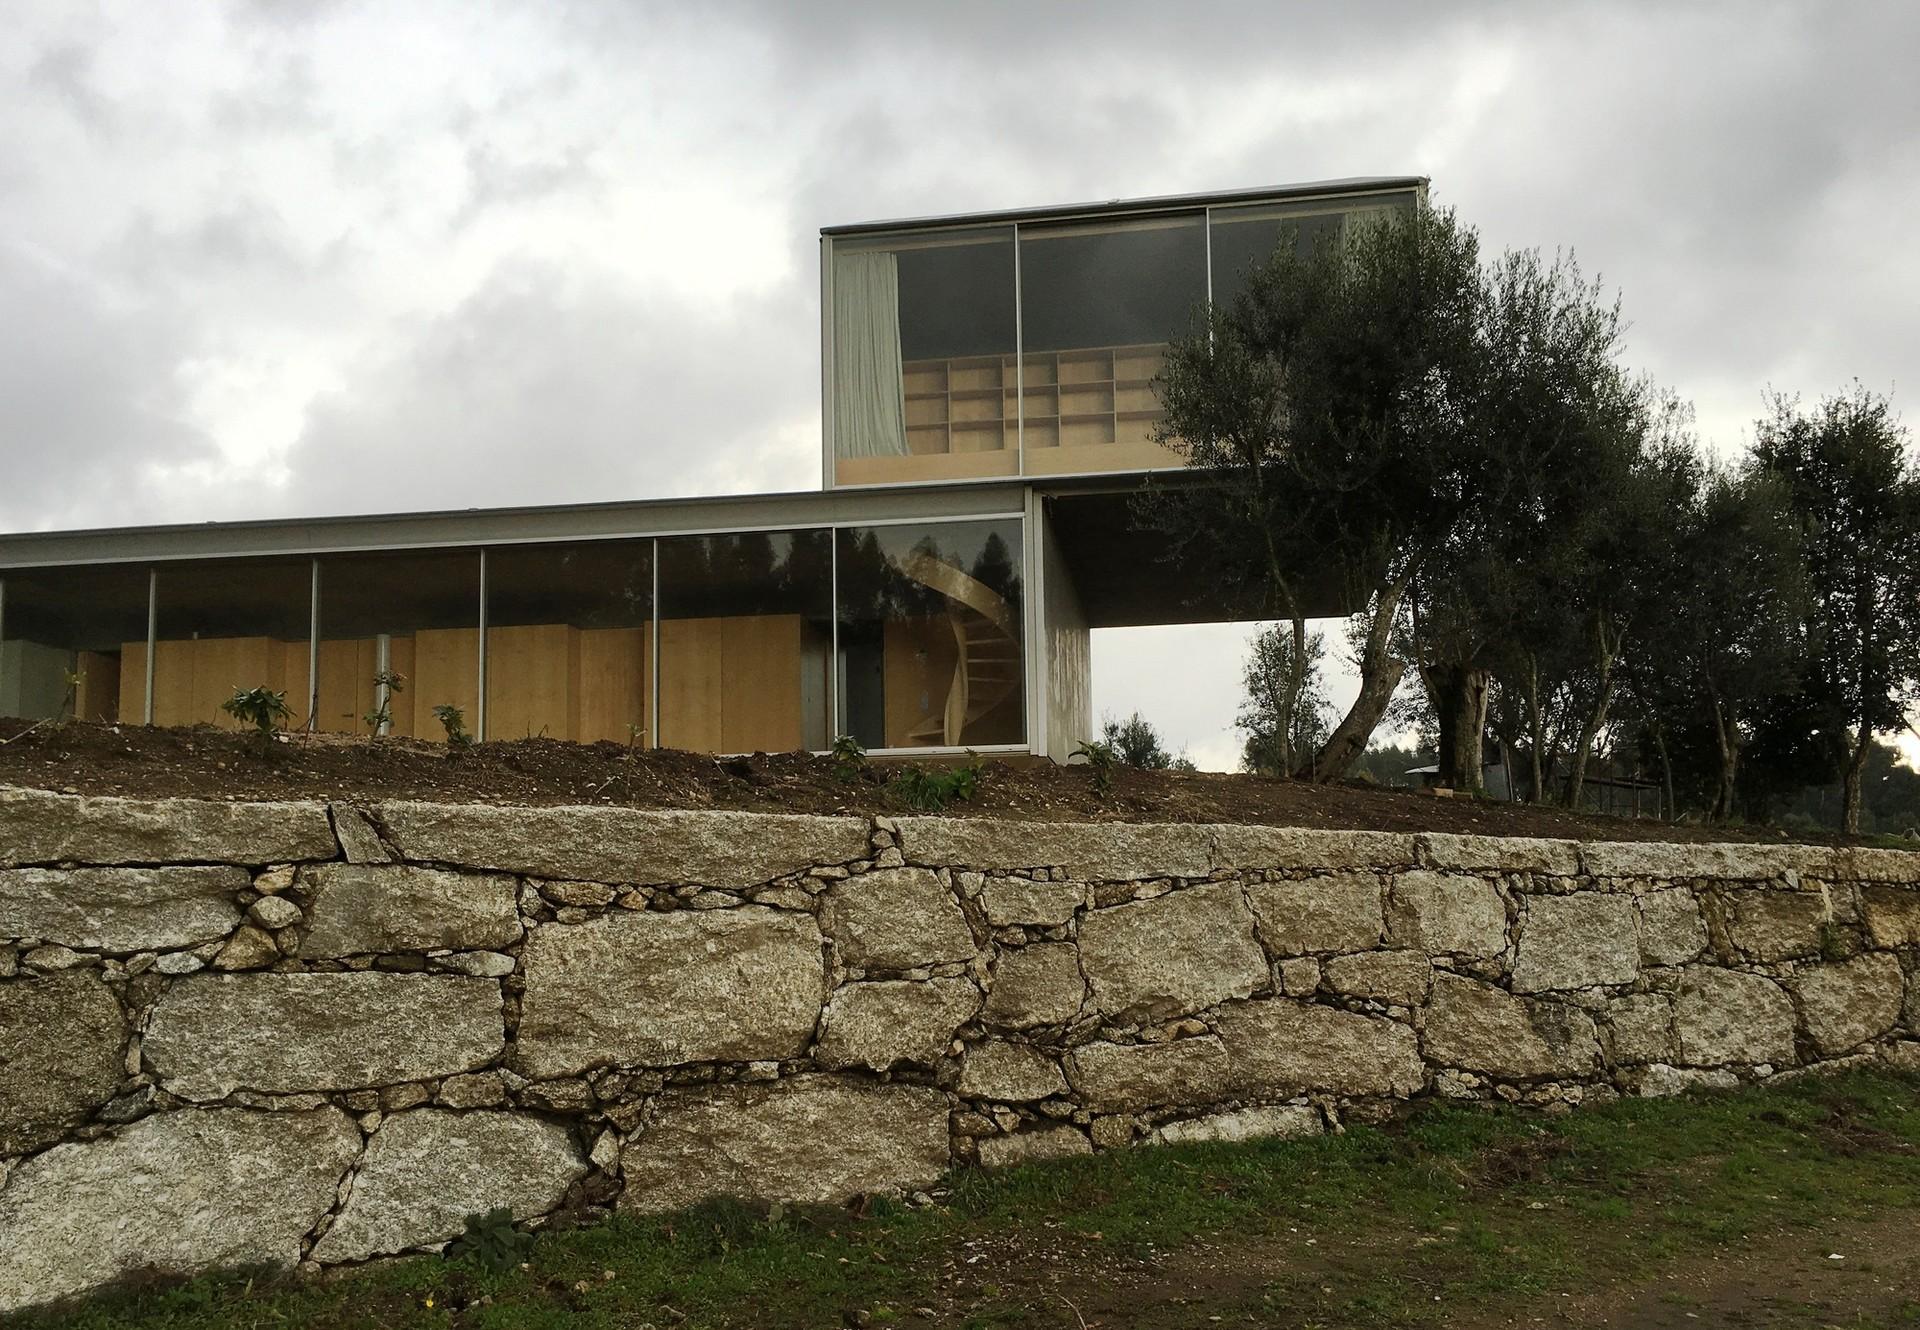 Best Architecture Projects 3 best architecture projects Best Architecture Projects: theHouse by Correia/Ragazzi Arquitectos Best Architecture Projects 3